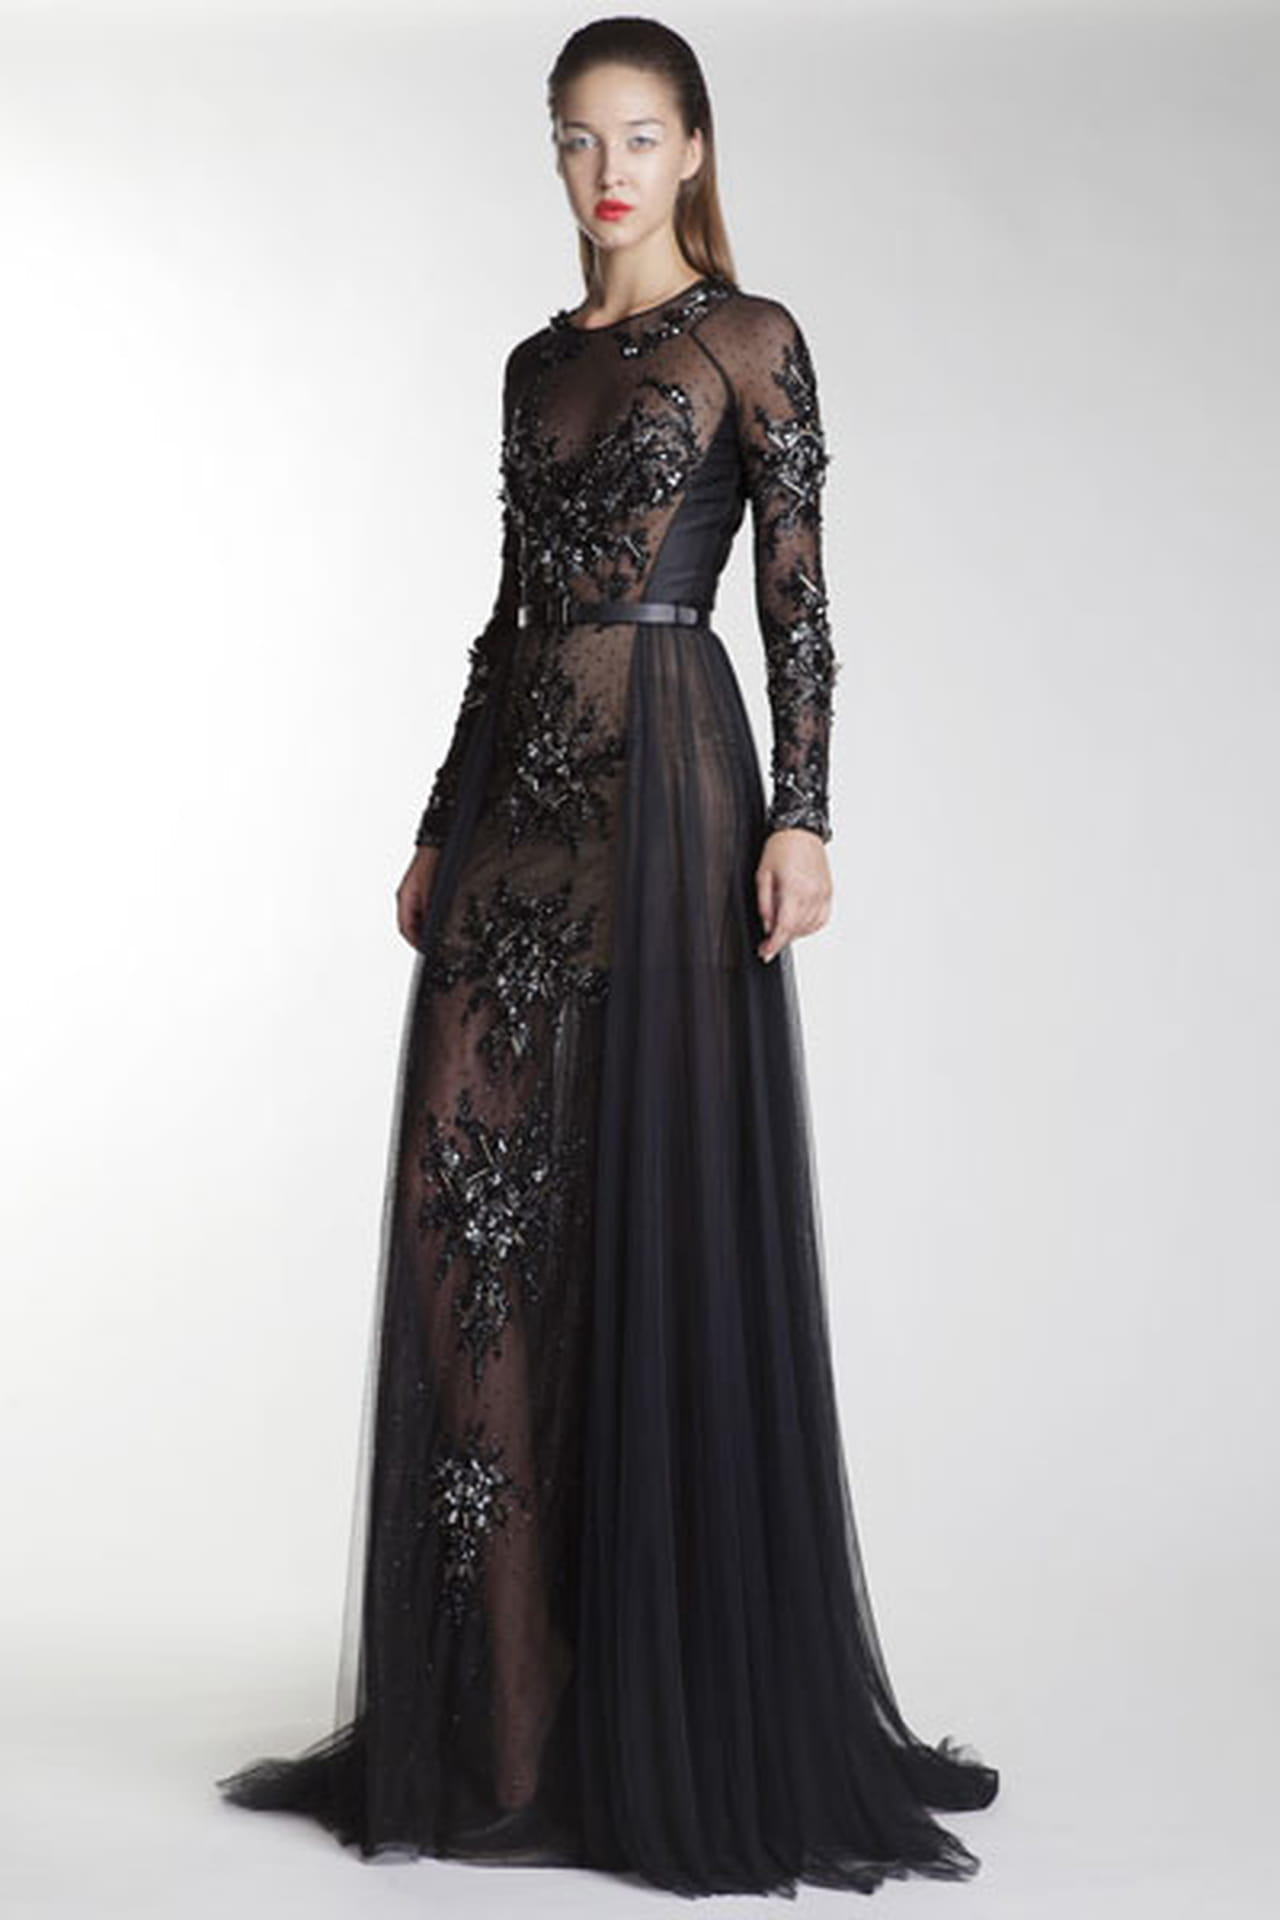 2987570f0 فستان أسود بأكمام ذو تطريزات براقة من باسل سودا Basil Soda.